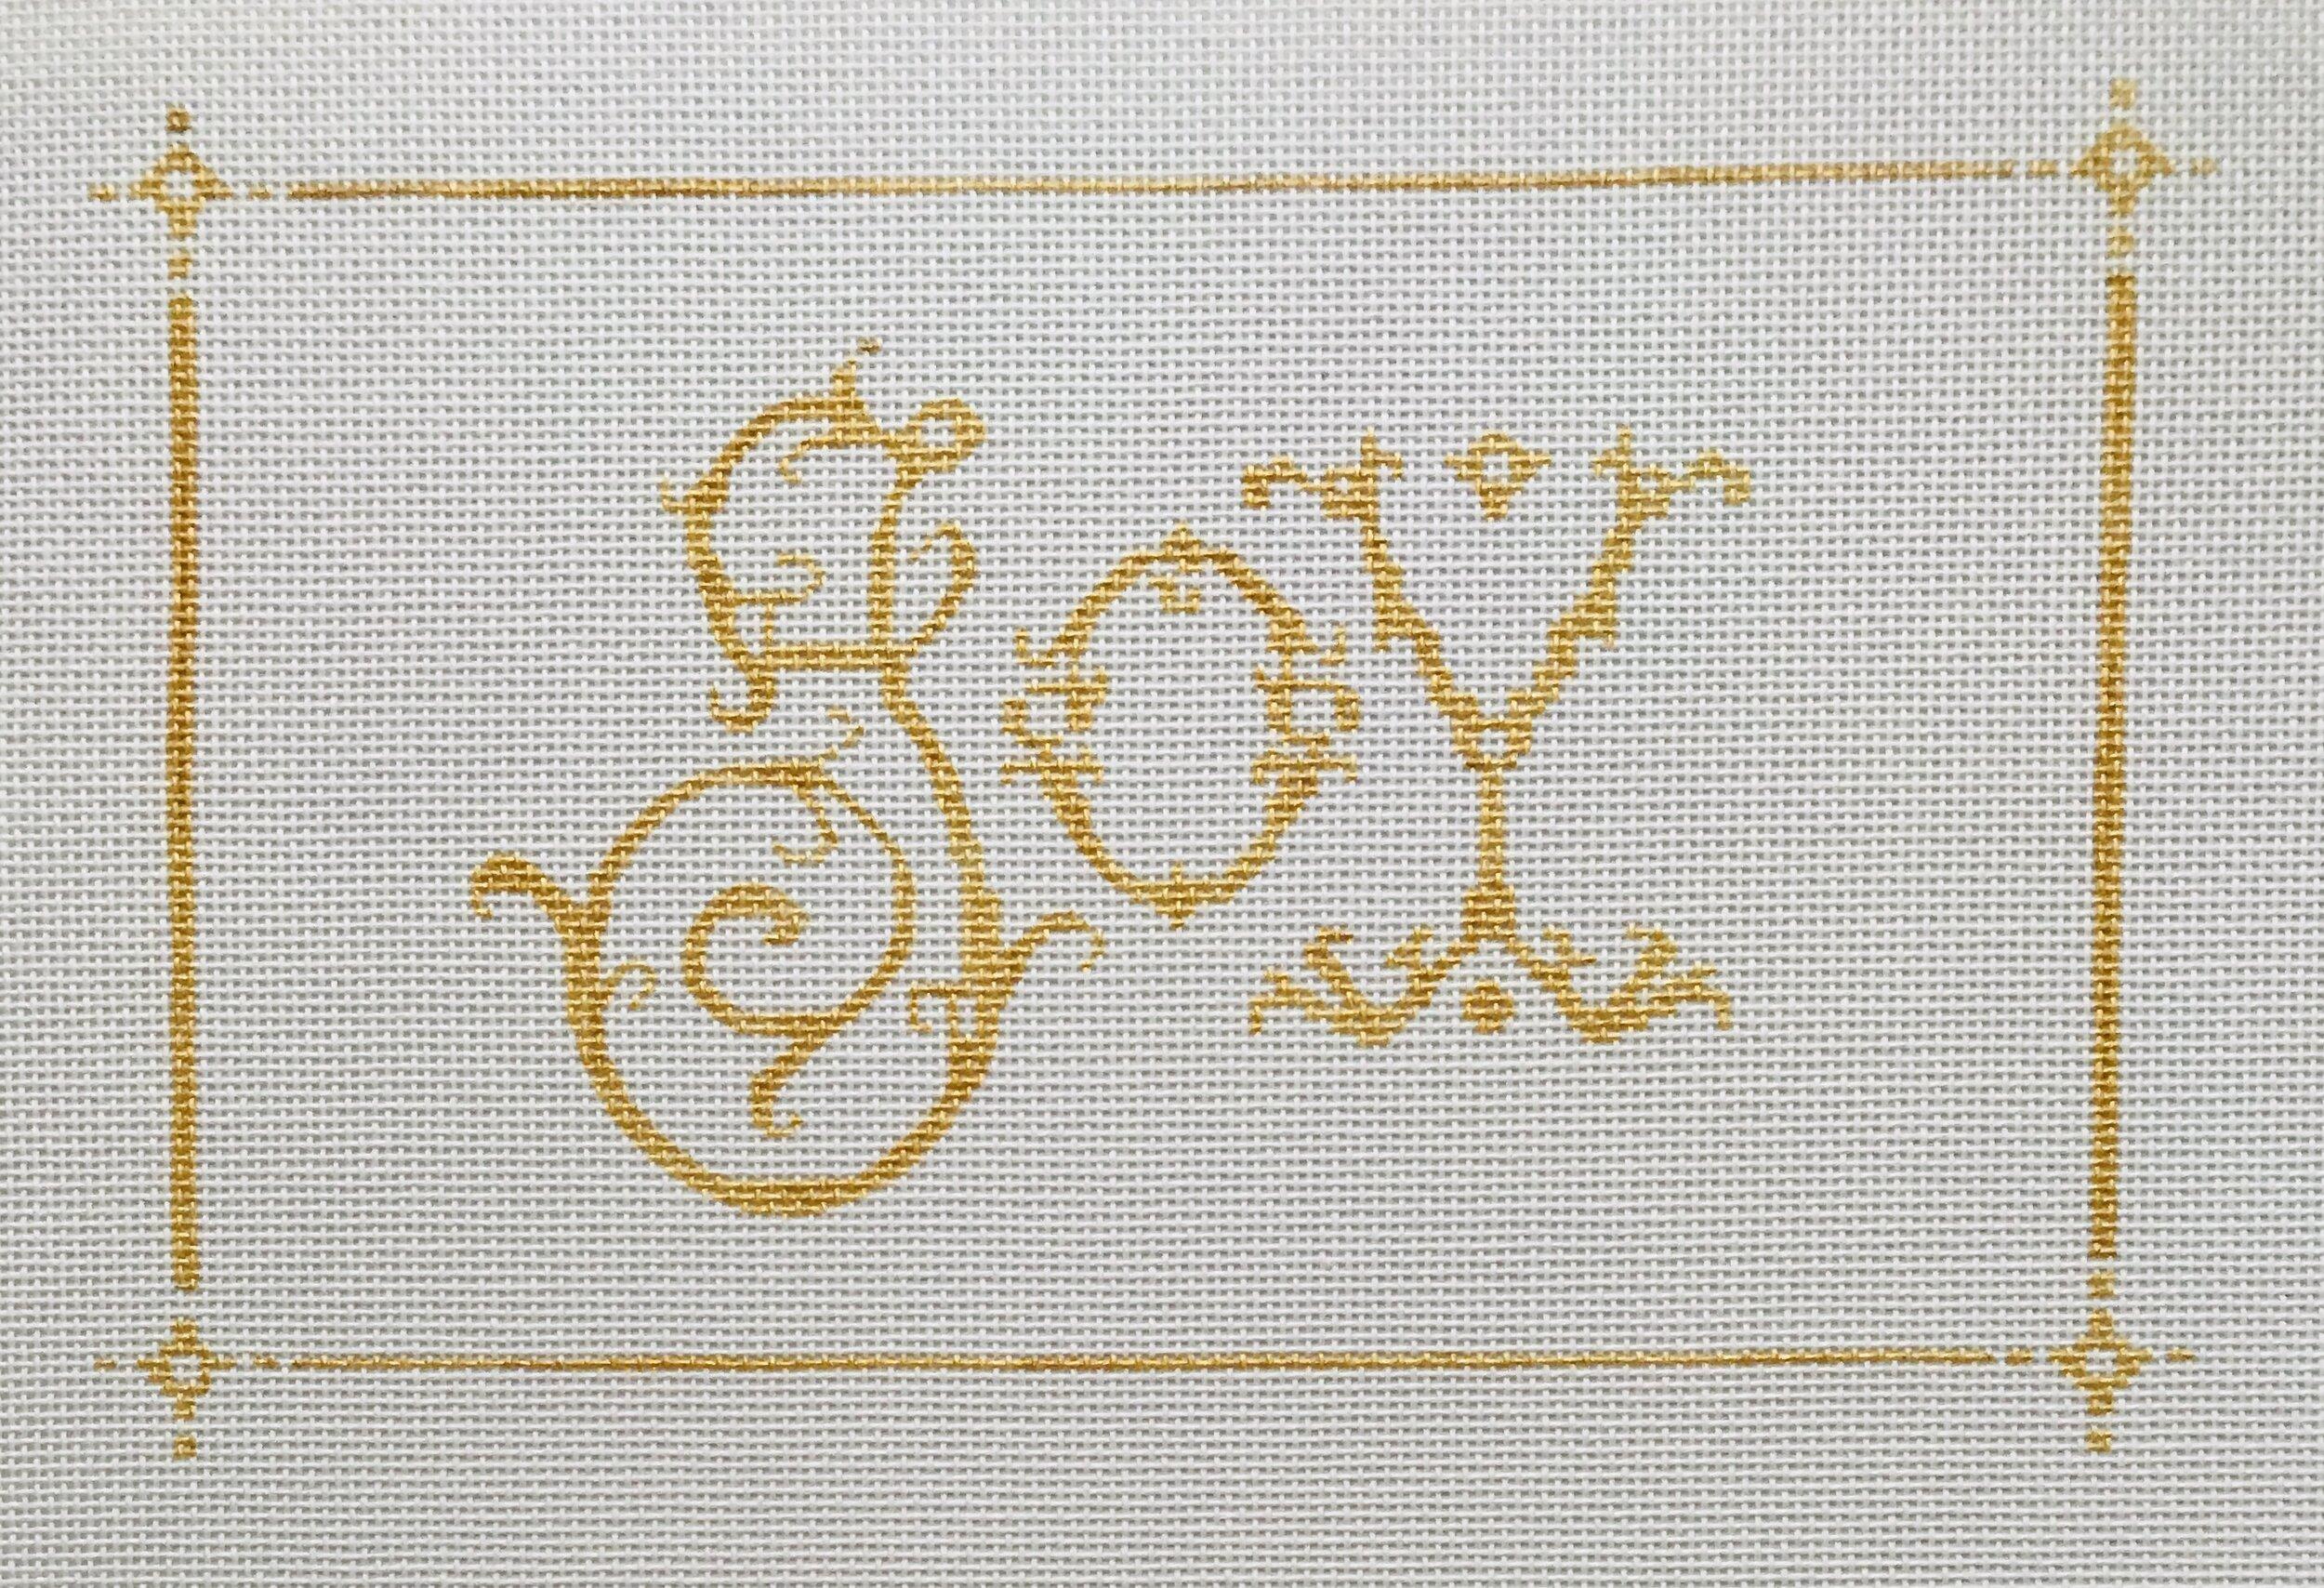 "Joy ALJPL1   9"" x 6"" on 18 mesh"